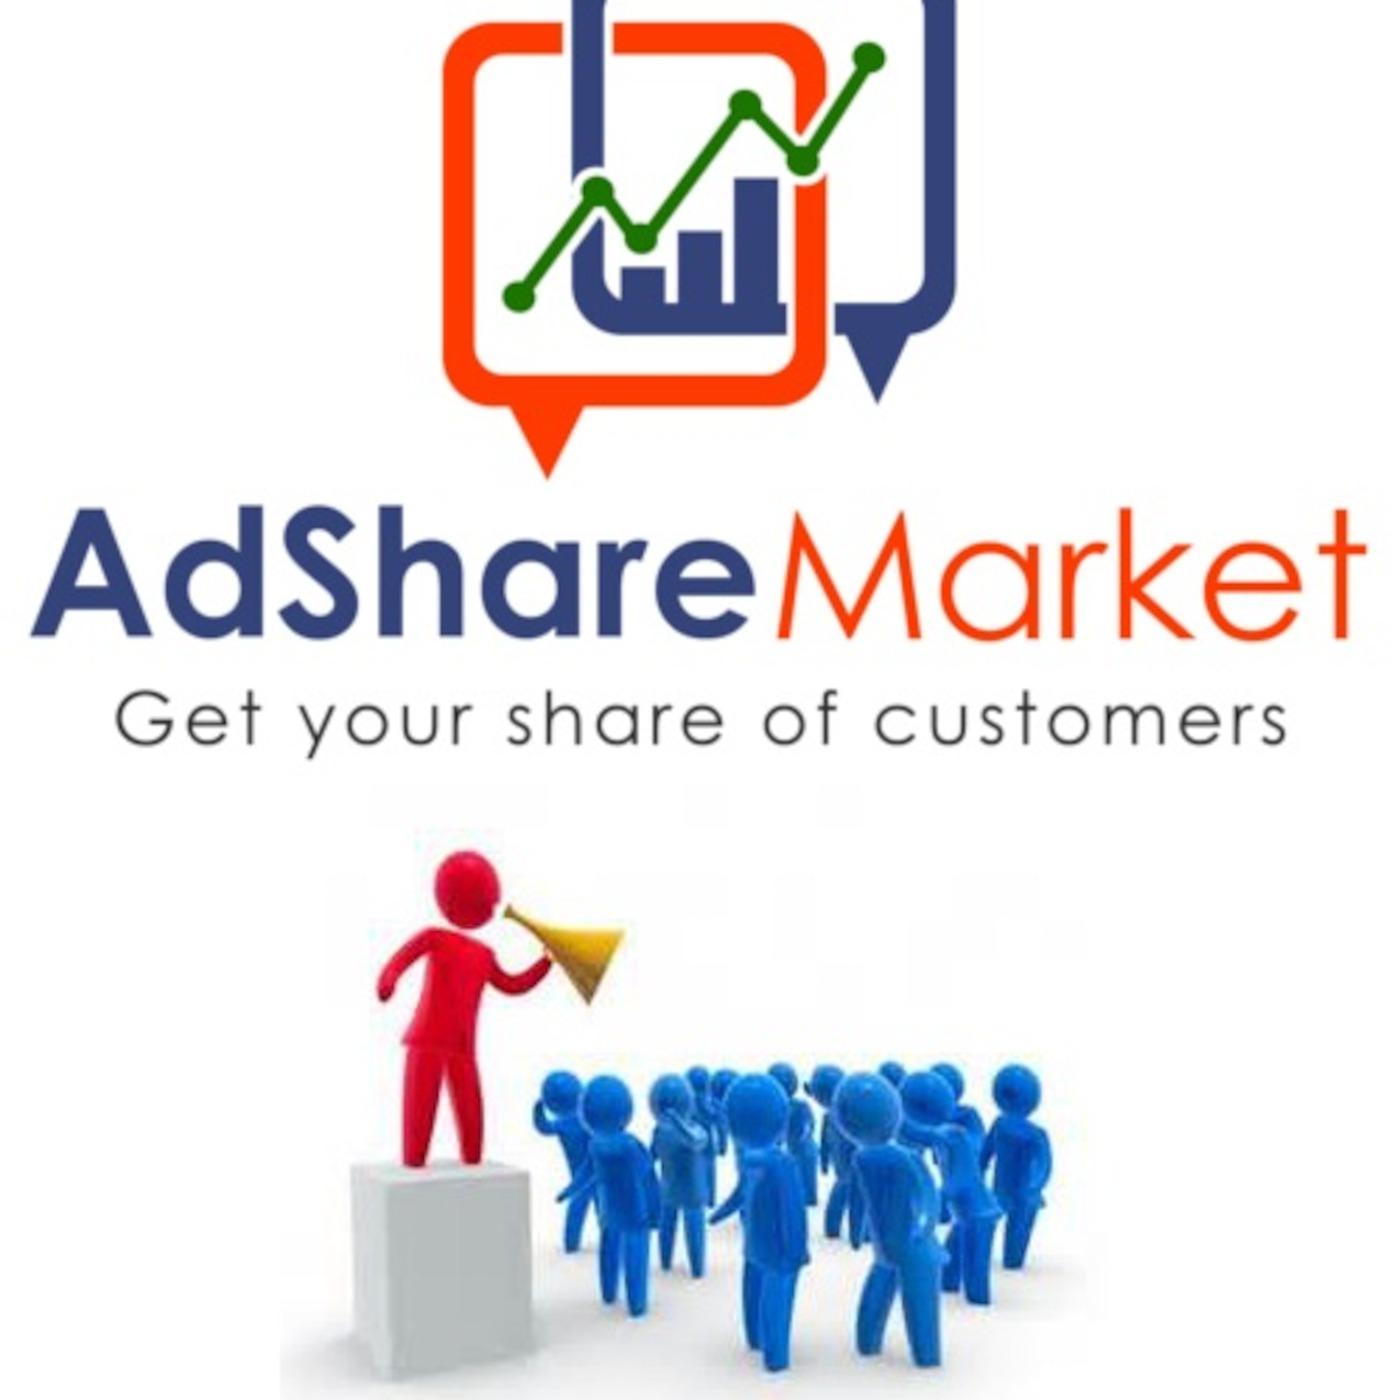 Adsharemarket - The Adsense Alternative